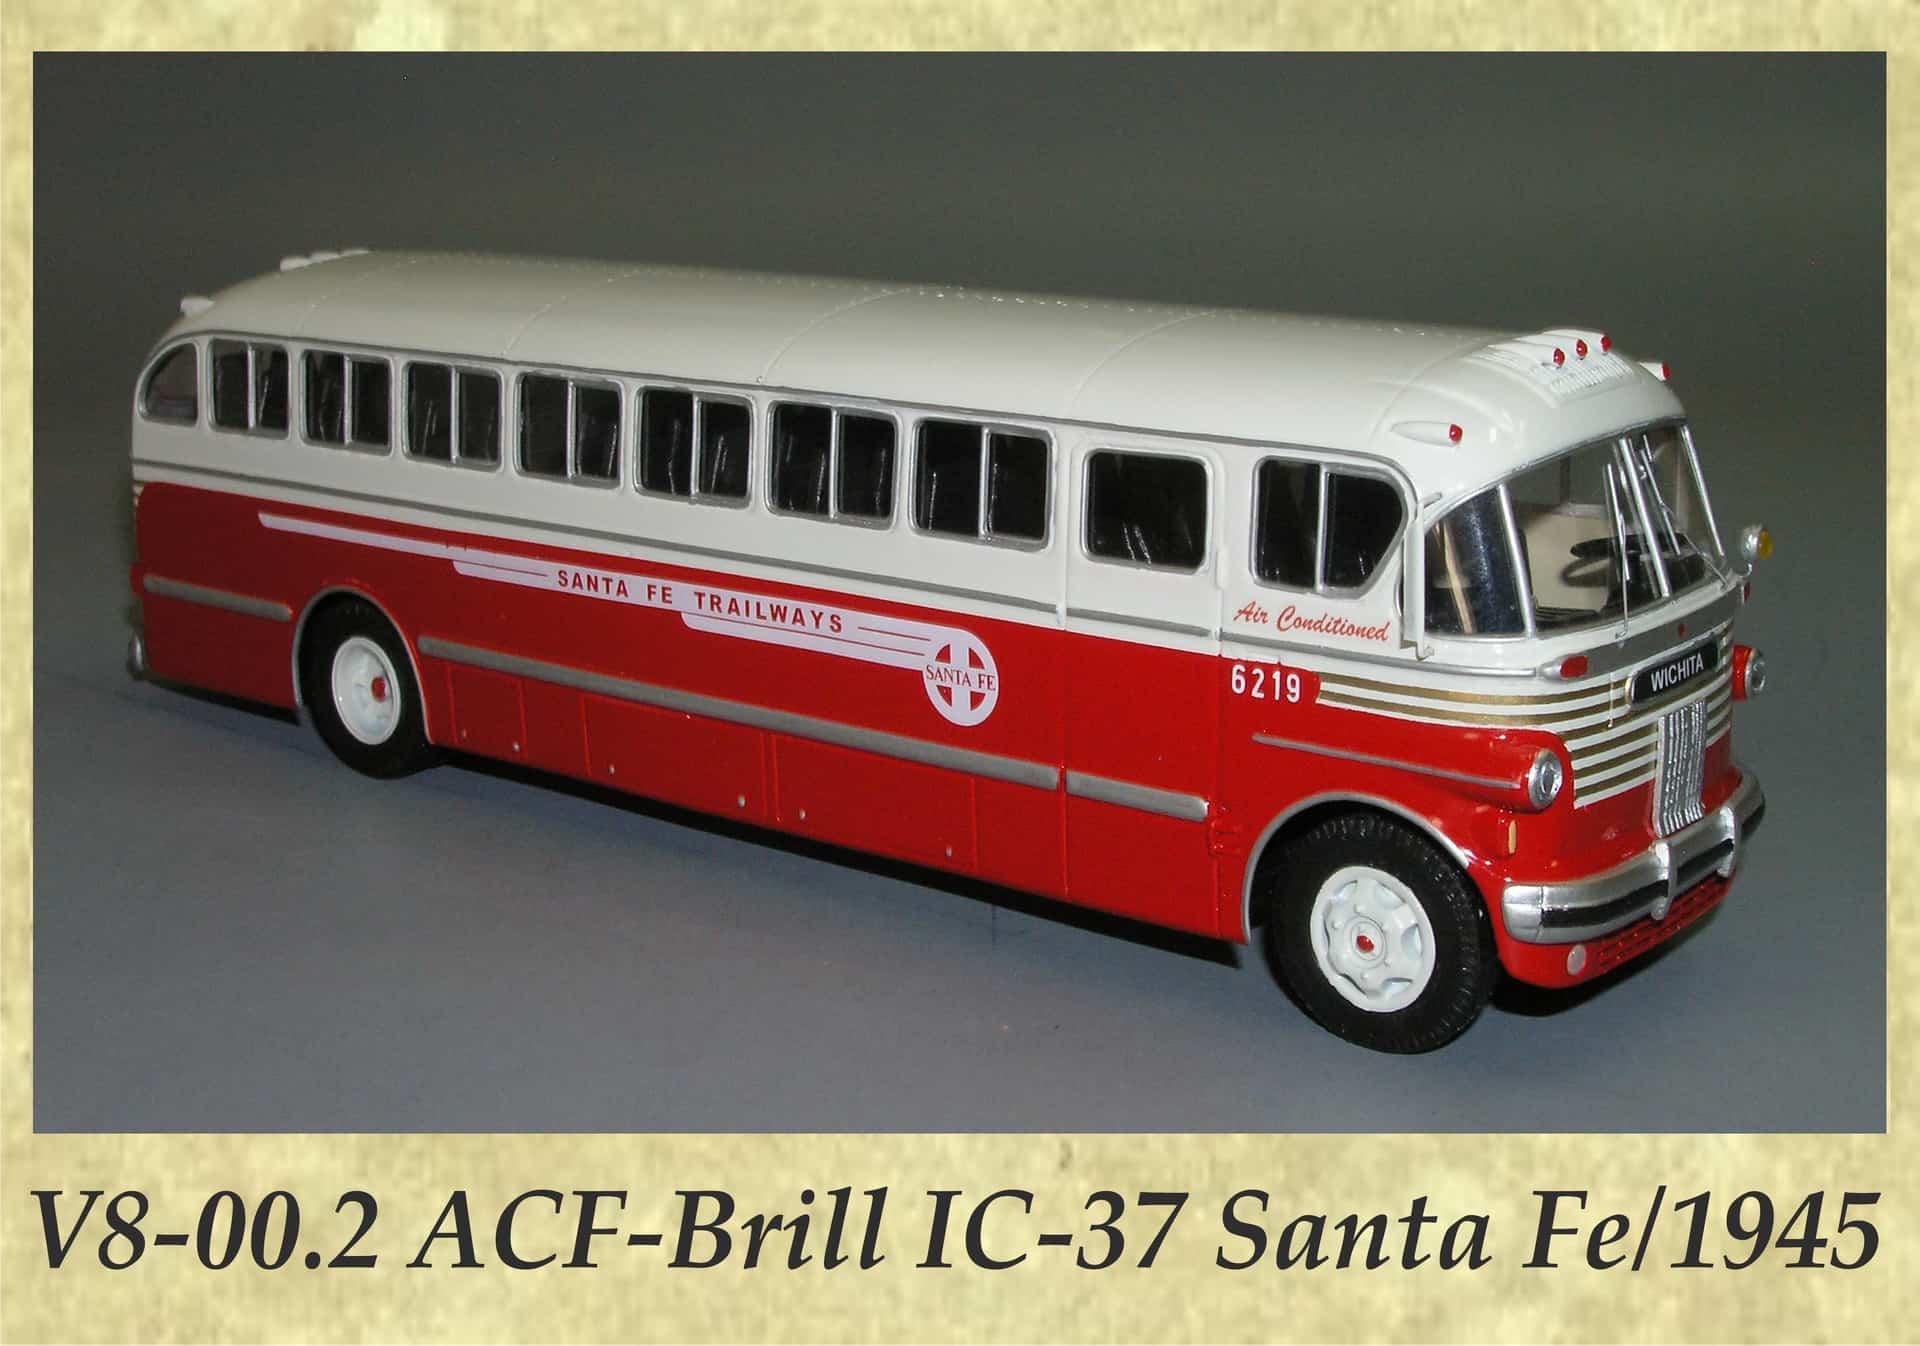 V8-00.2 ACF-Brill IC-37 Santa Fe_1945